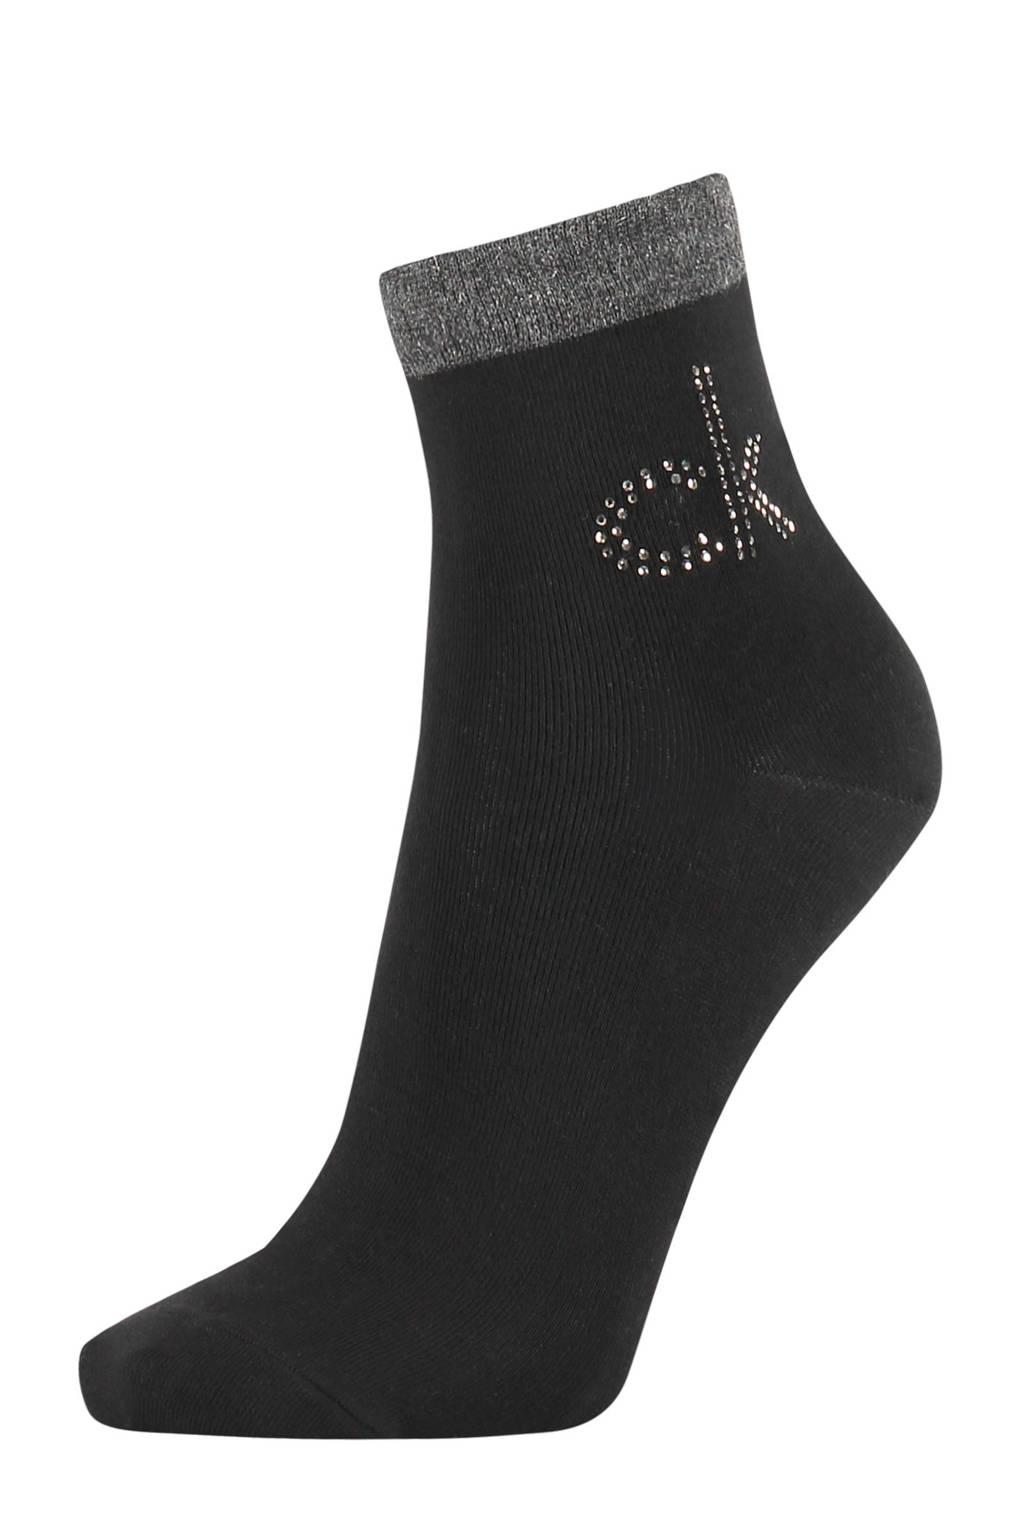 CALVIN KLEIN sokken, Zwart